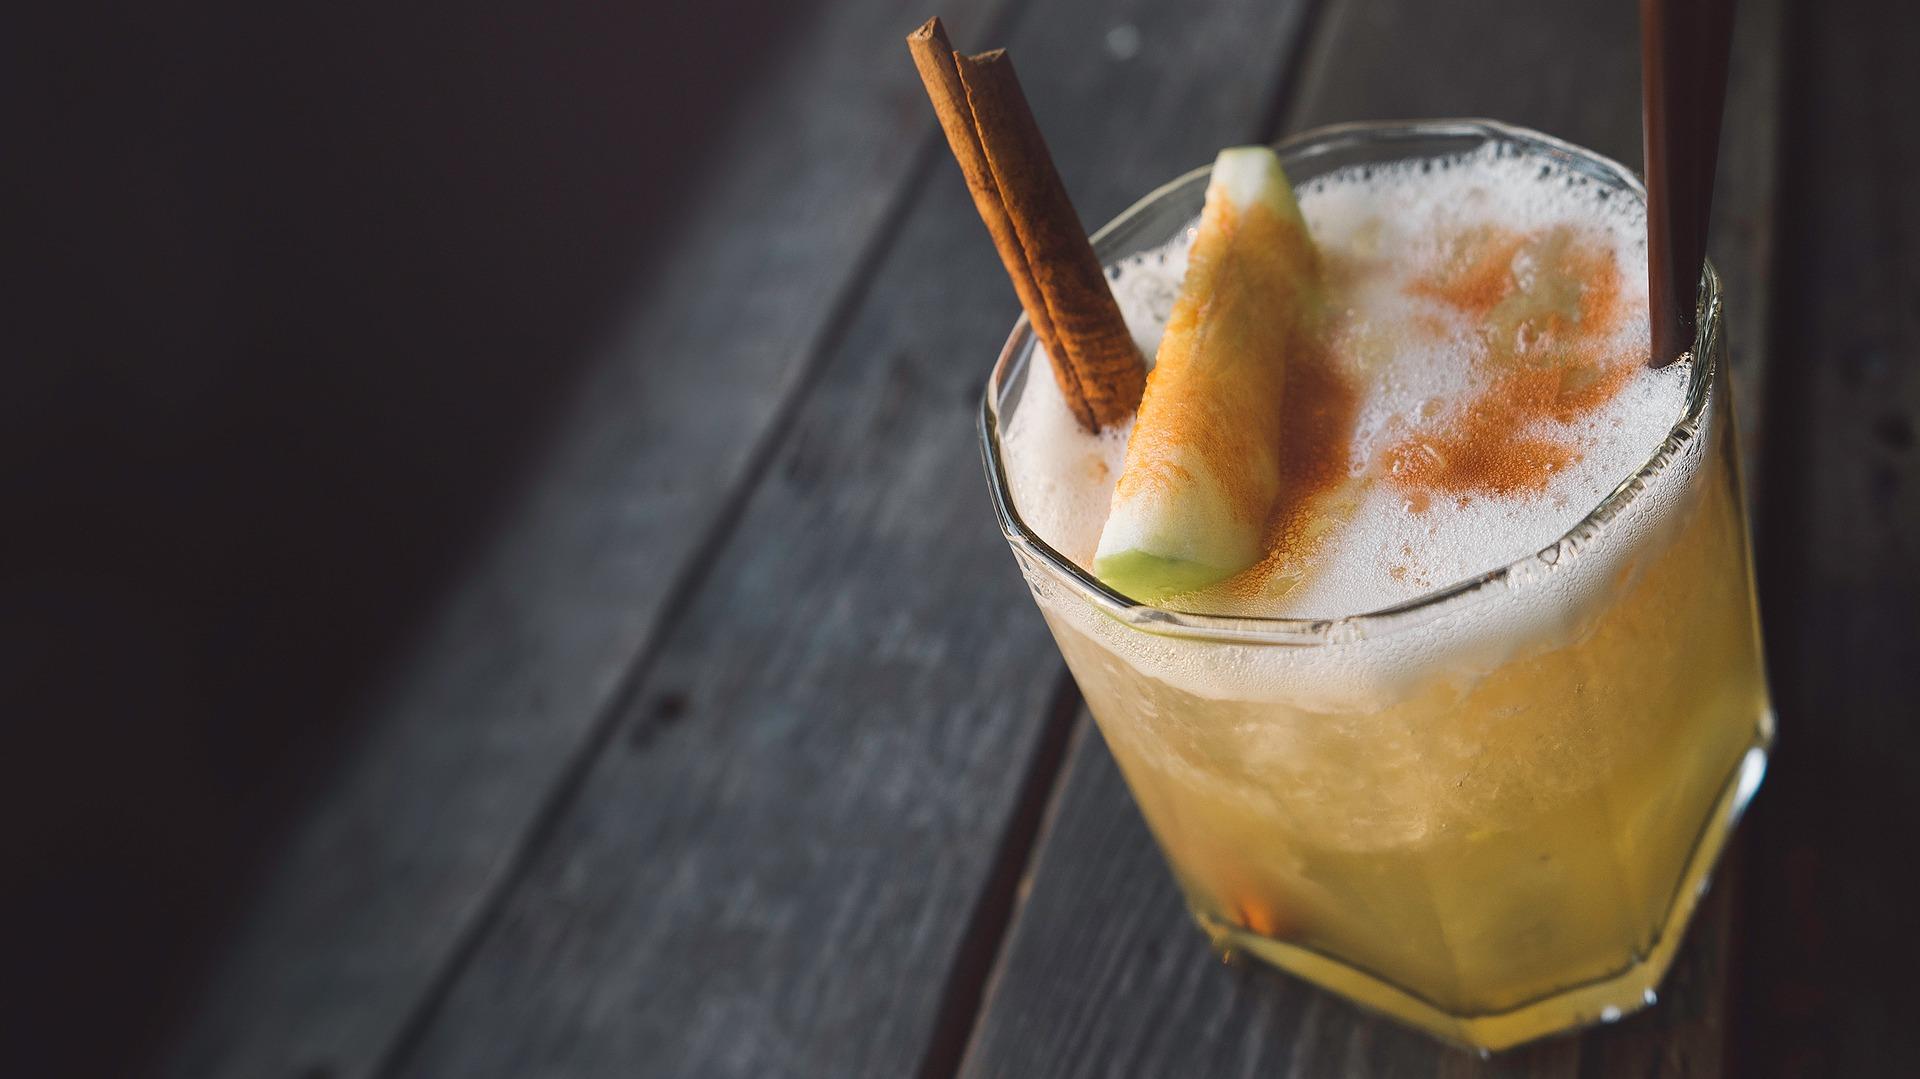 cocktail-2571489_1920.jpg